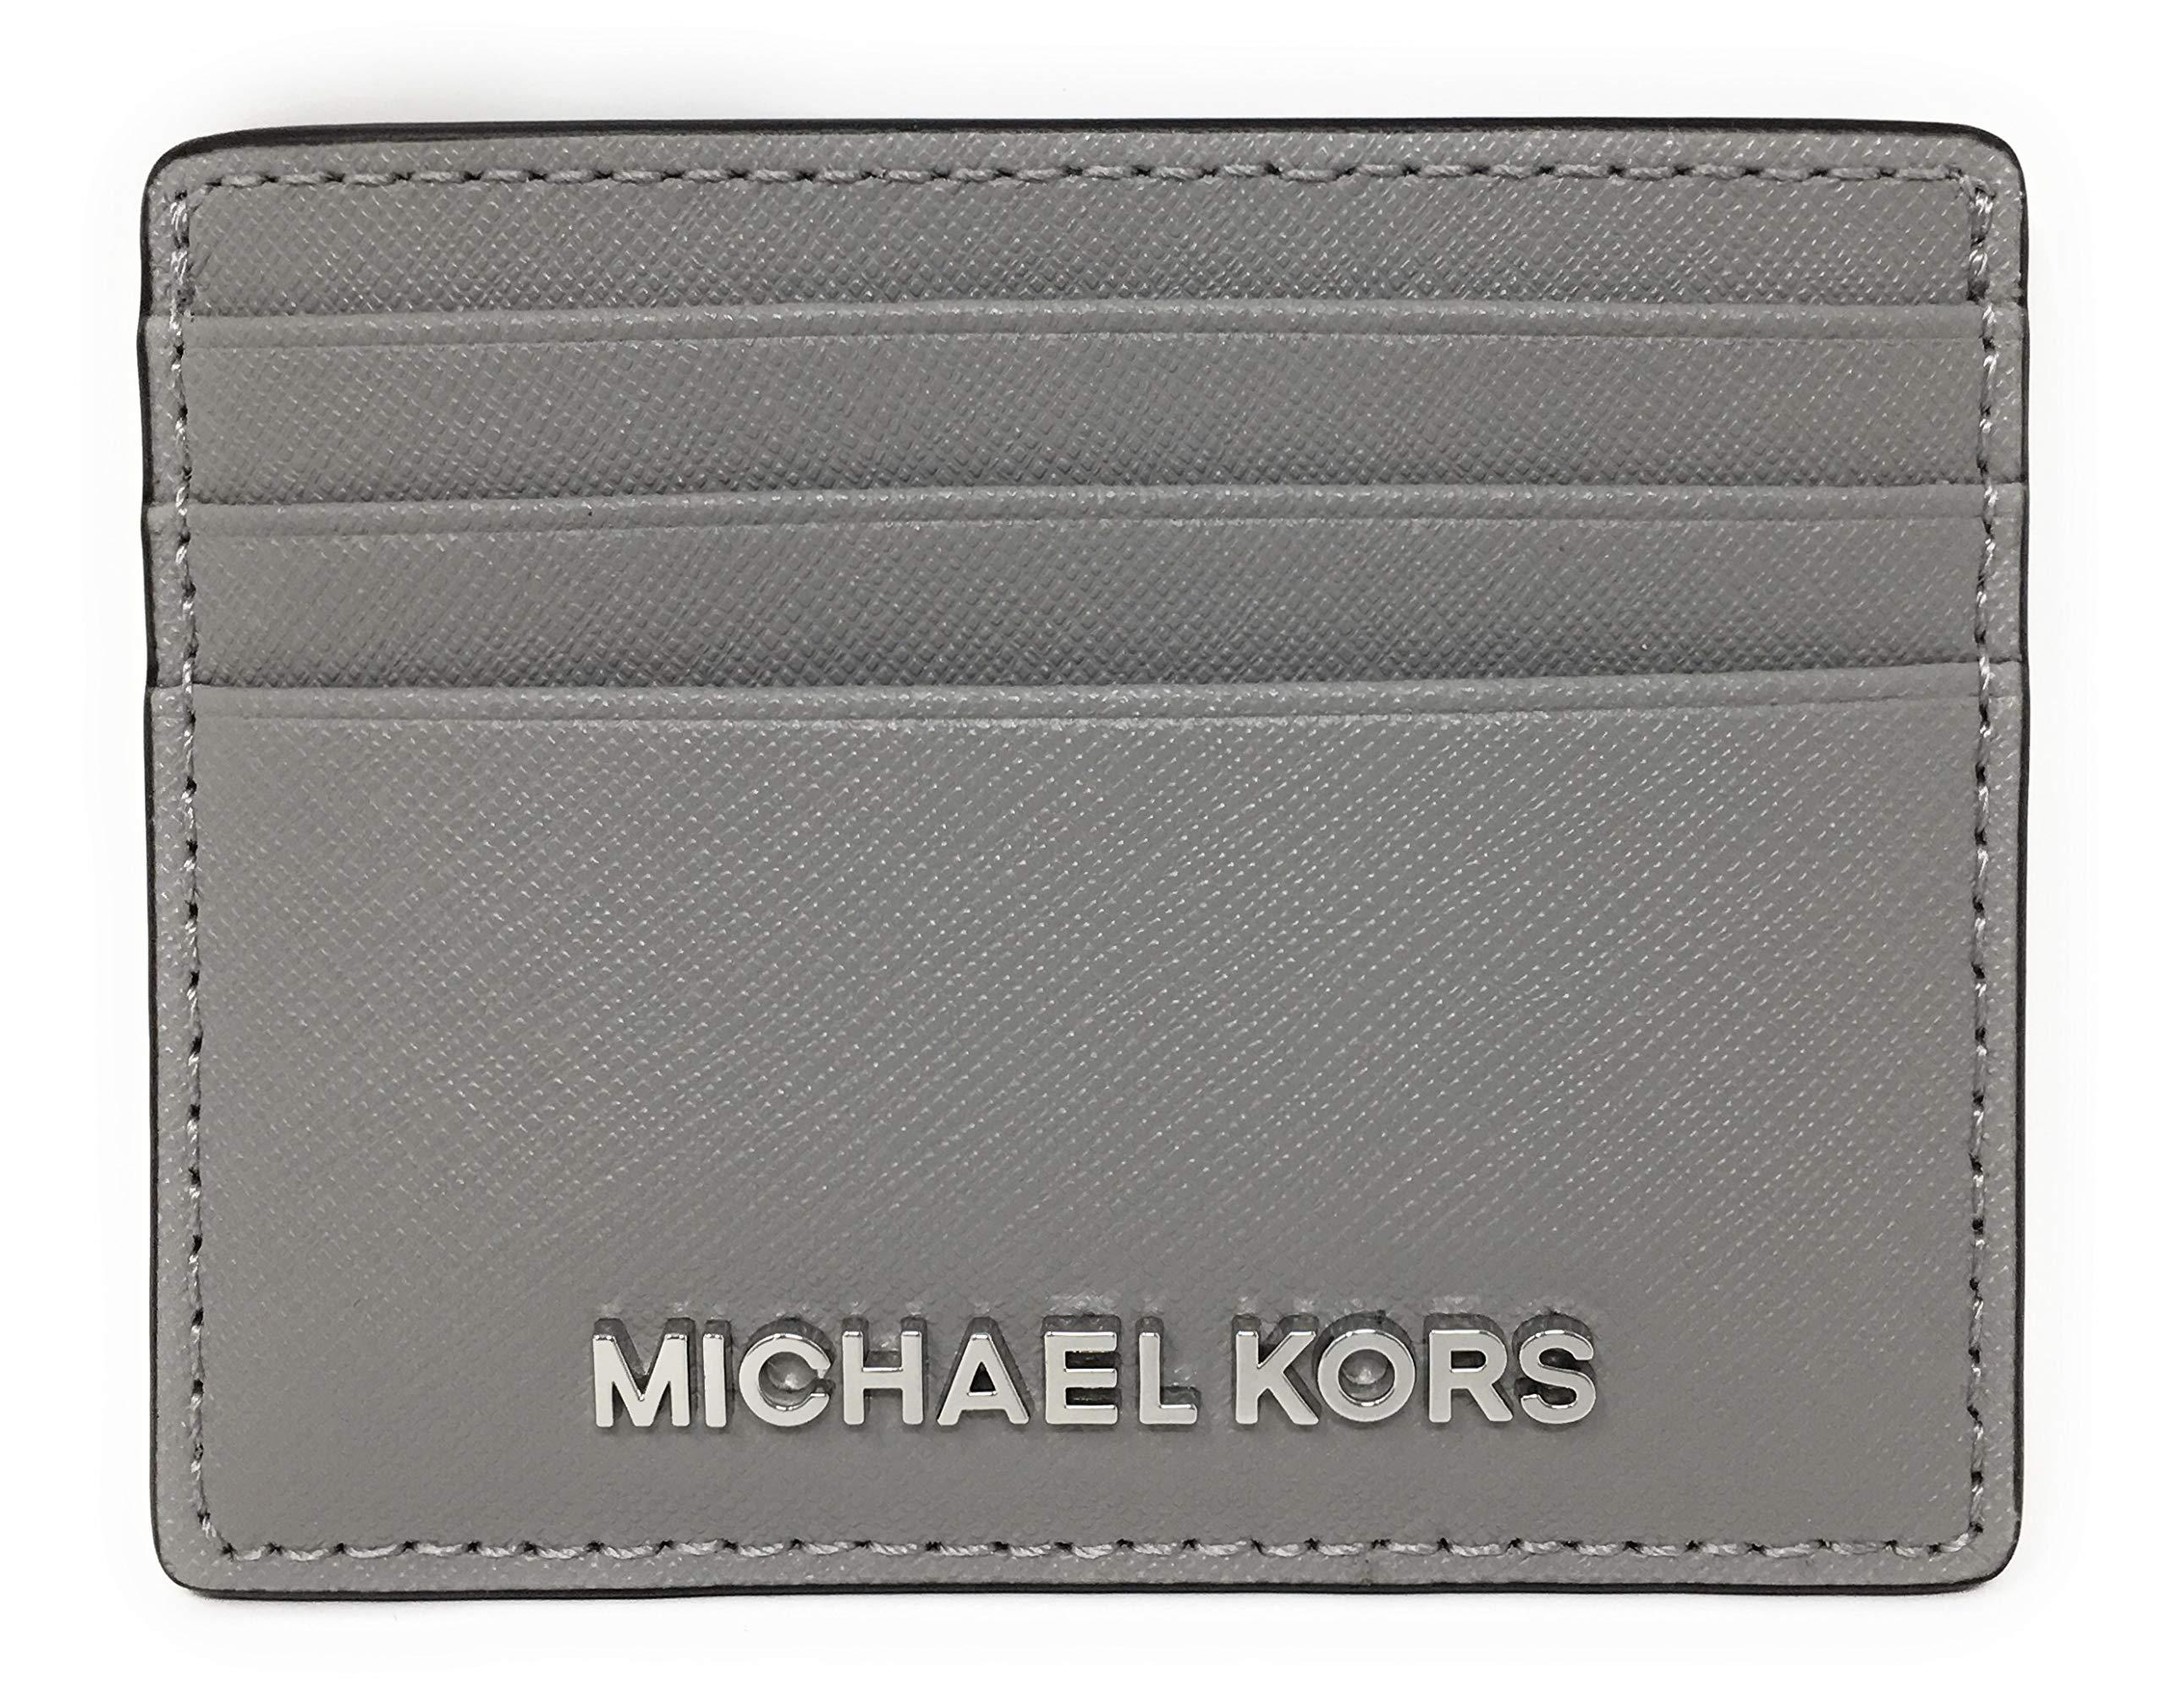 Michael Kors Jet Set Travel Large Saffiano Leather Card Holder (Ash Grey)